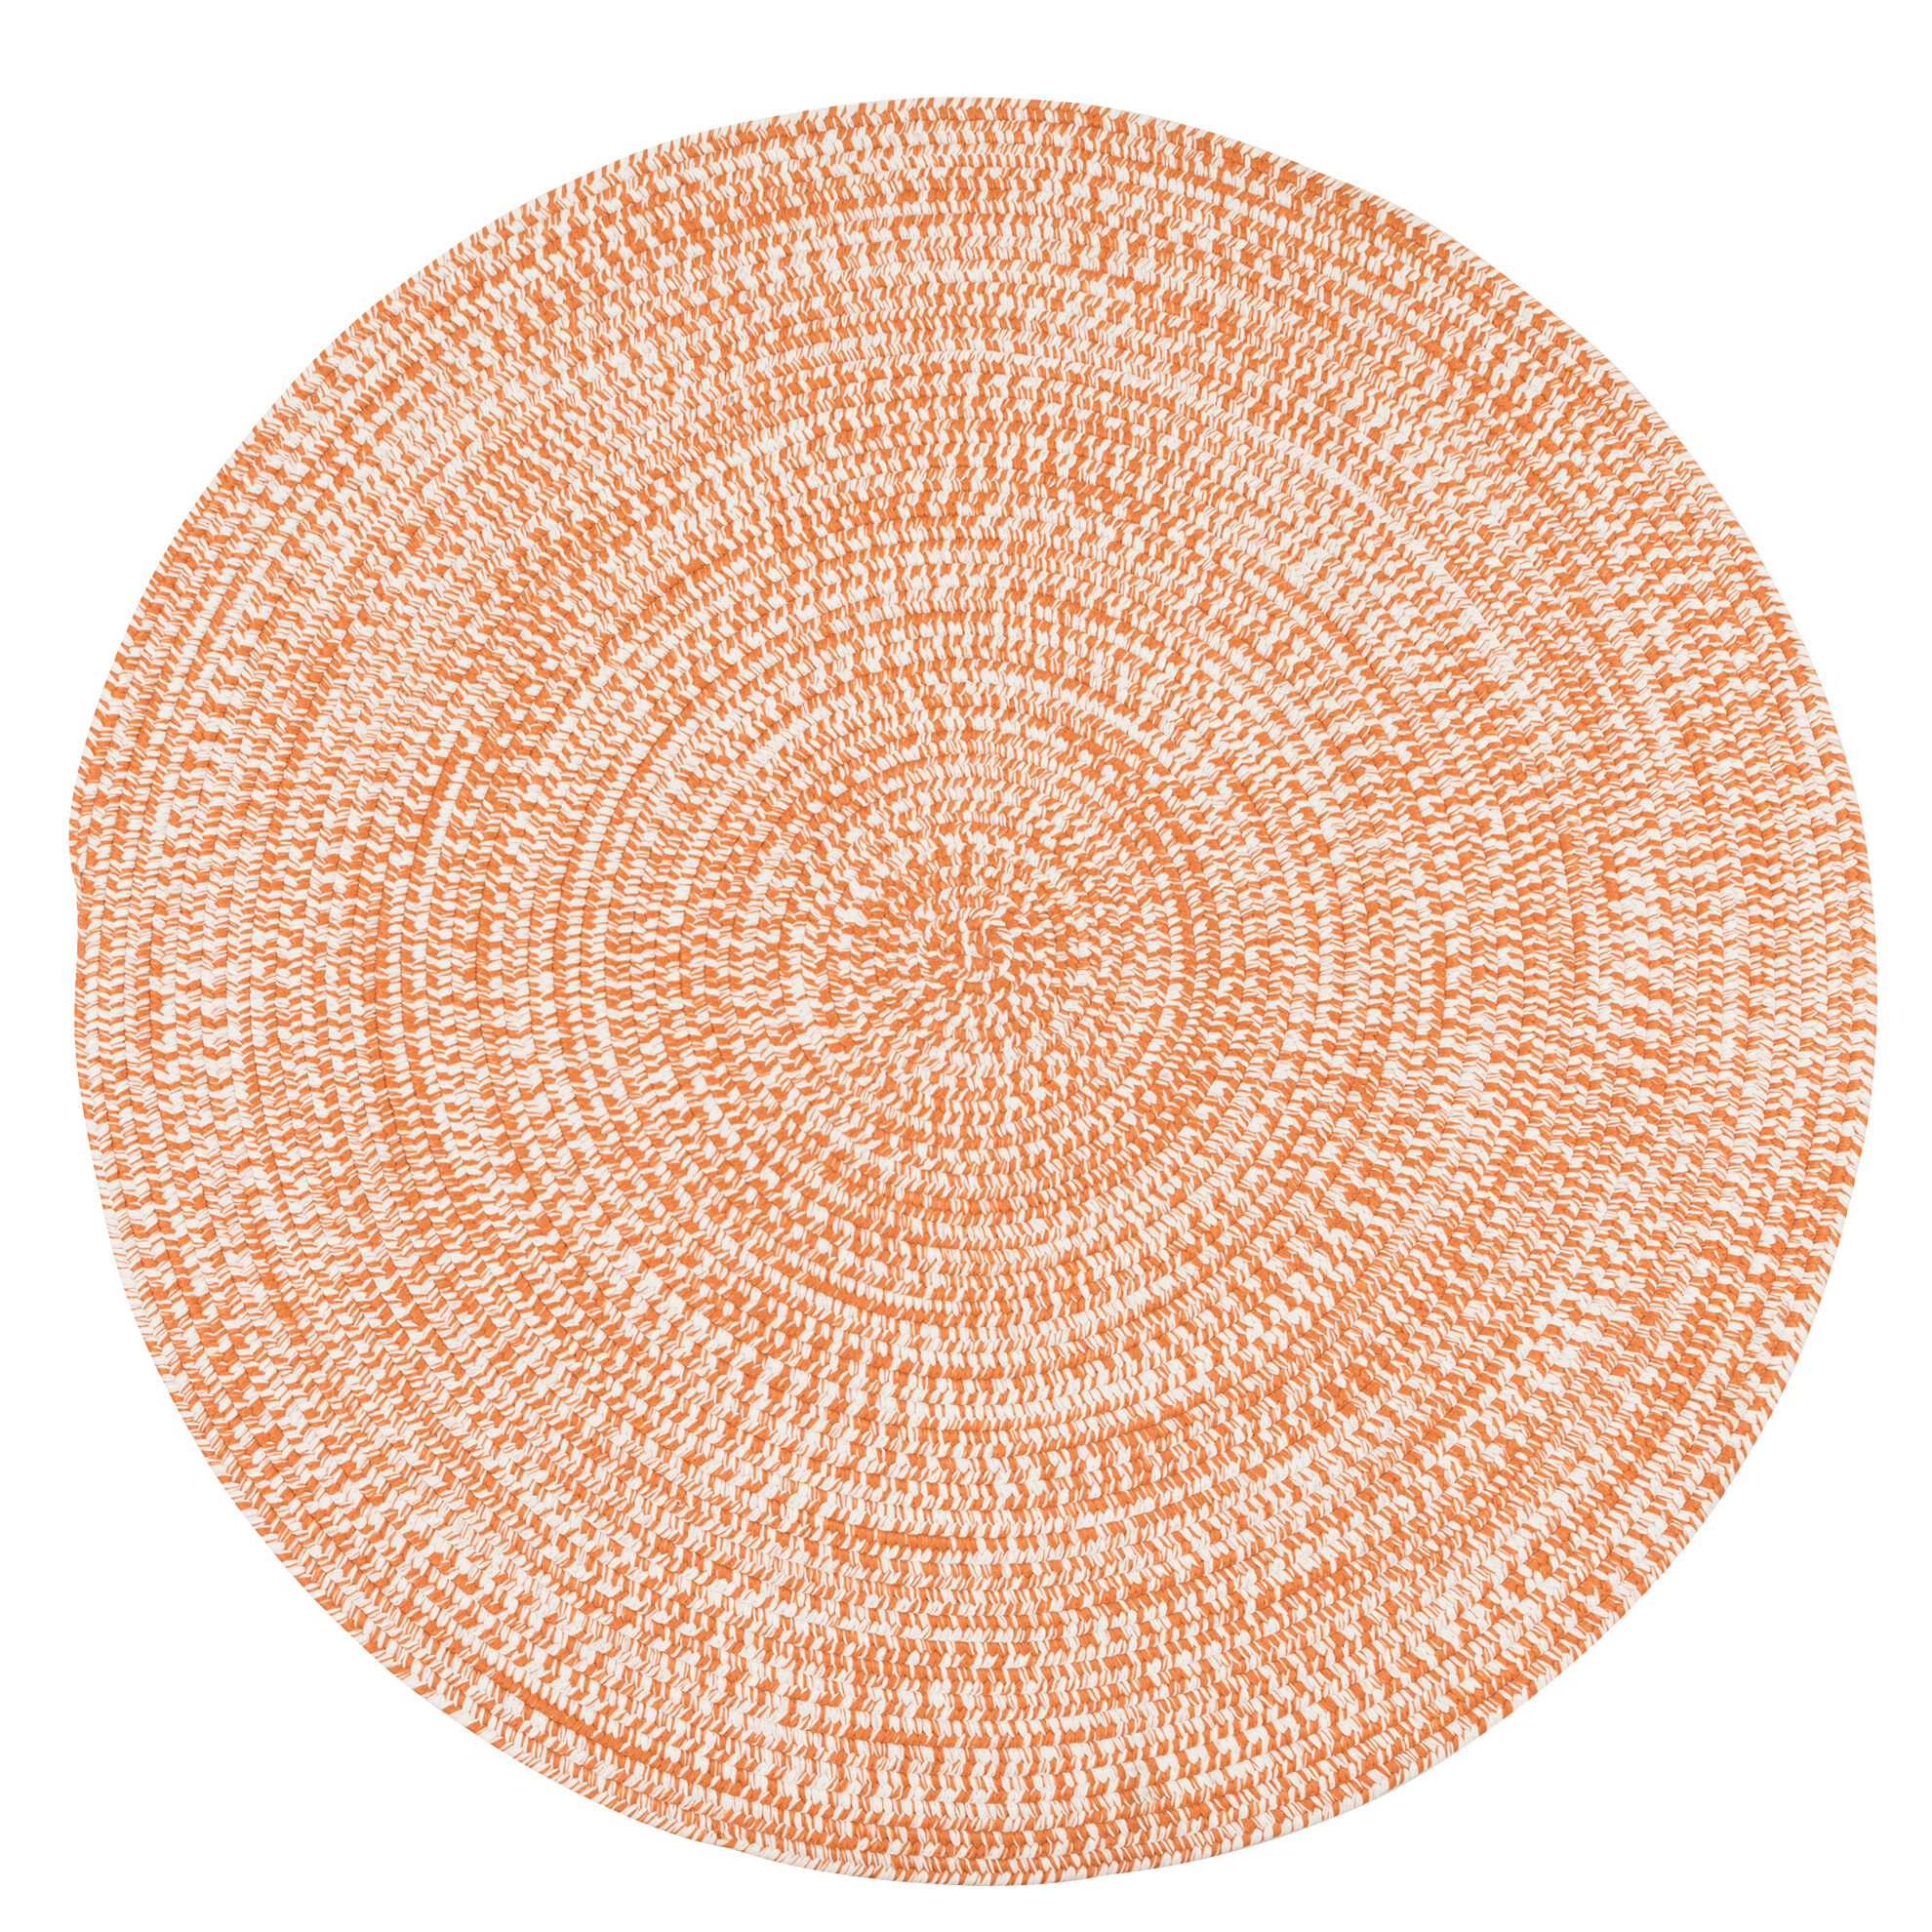 Longe Tweed Hand Braided Rusted Orange